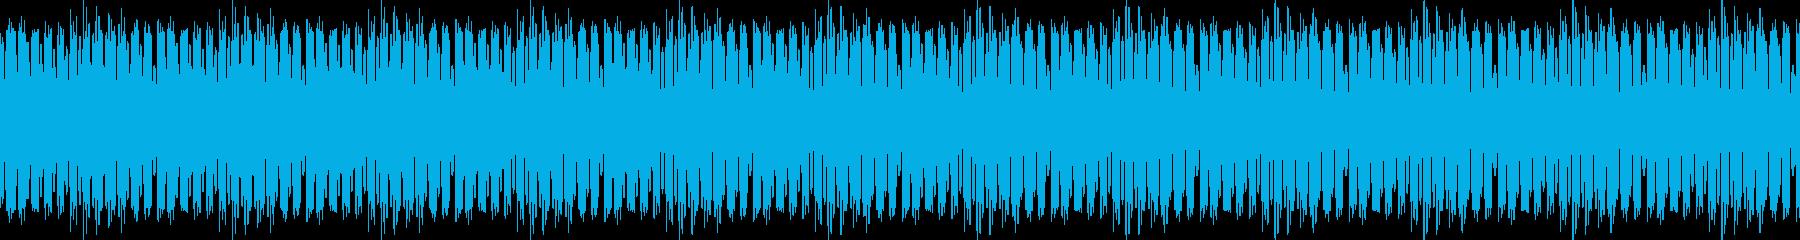 AMGアナログFX45の再生済みの波形